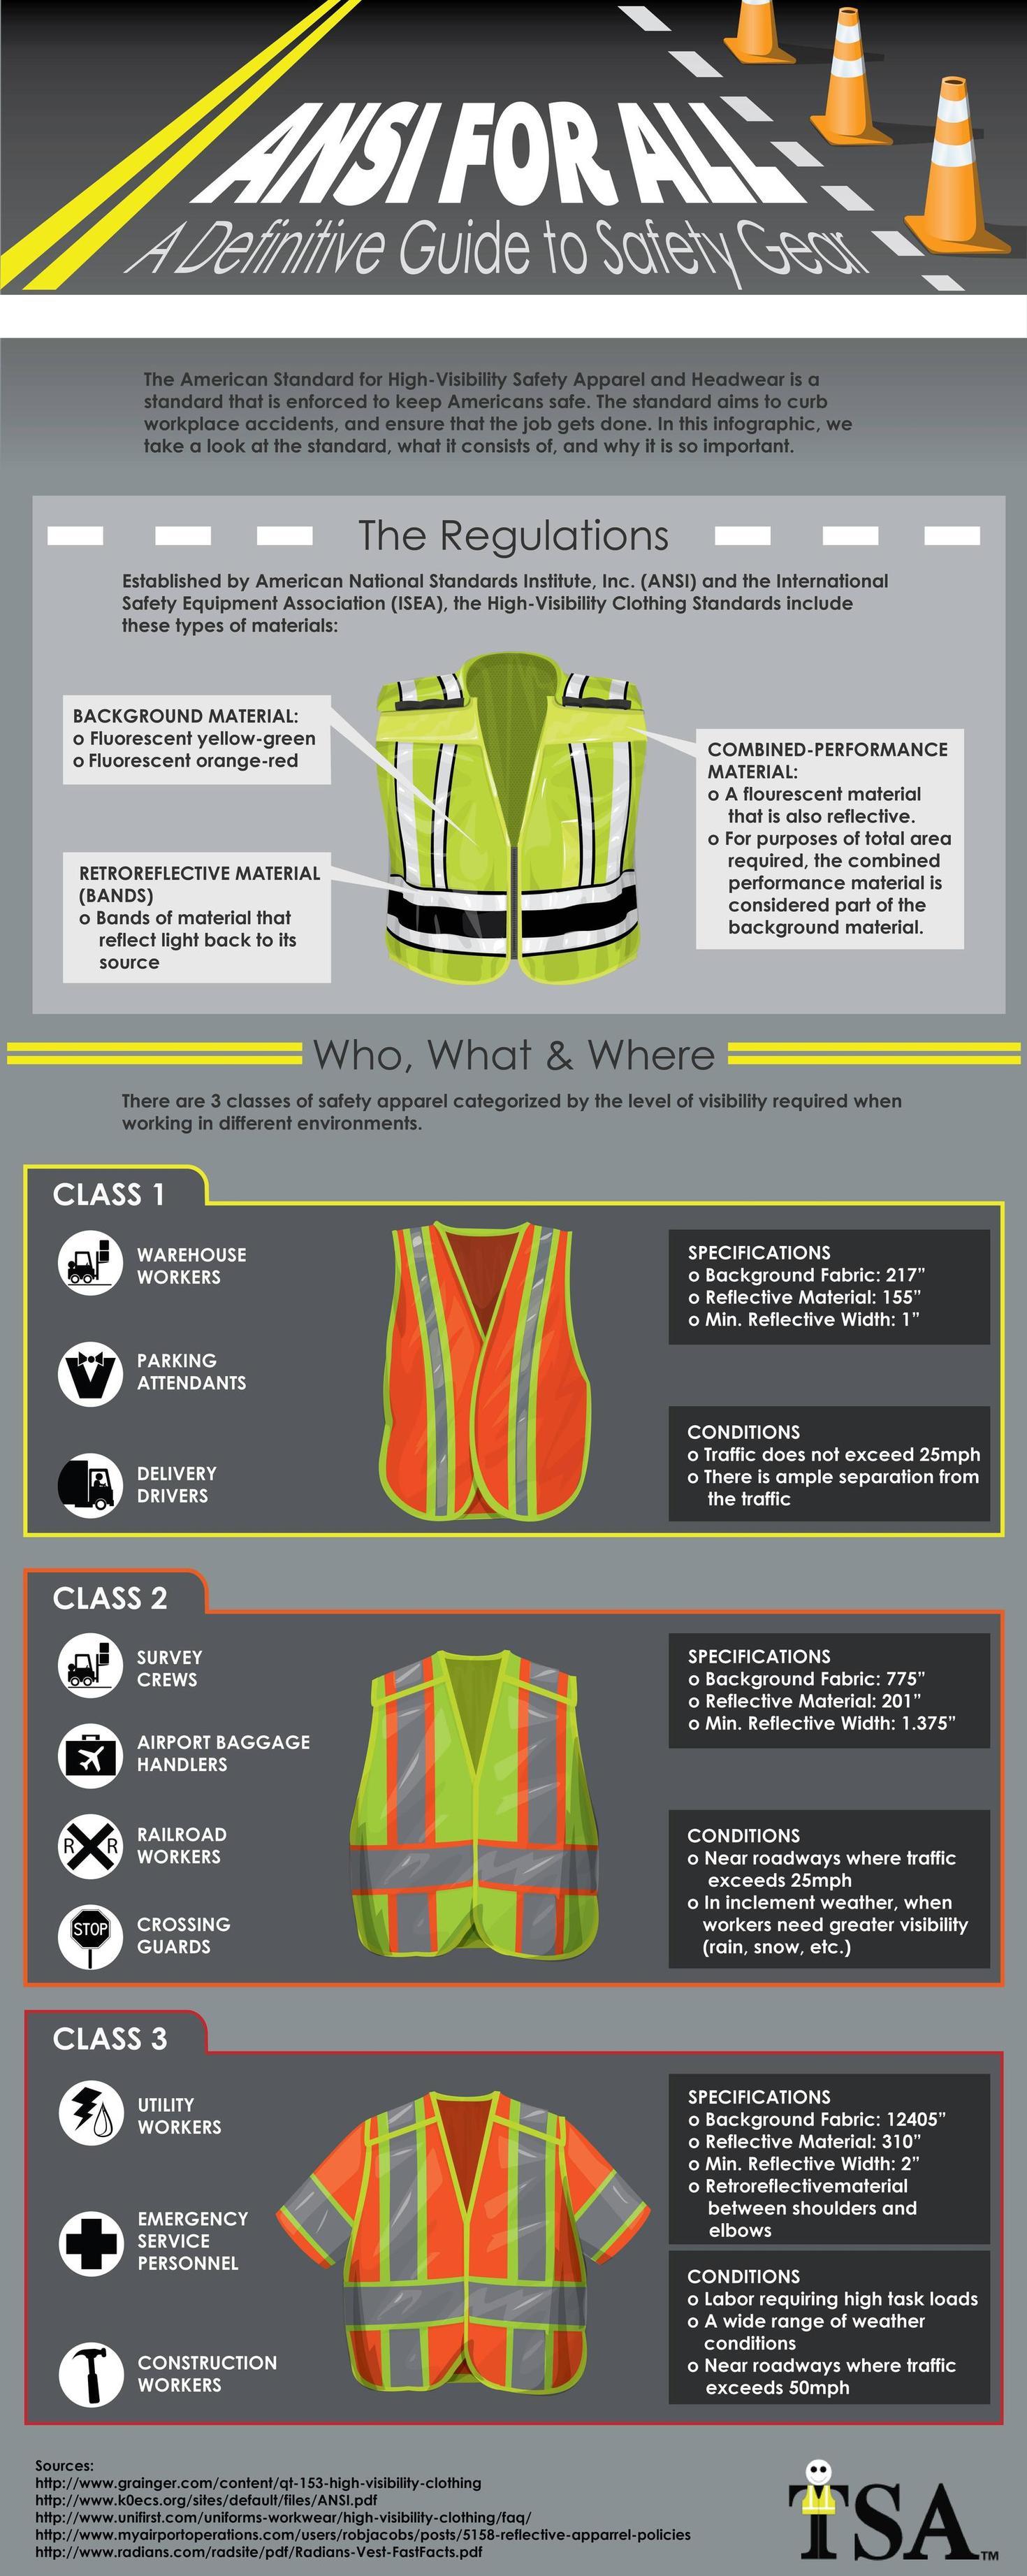 A Definitive Guide to Safety Gear - Atlantictraining.com